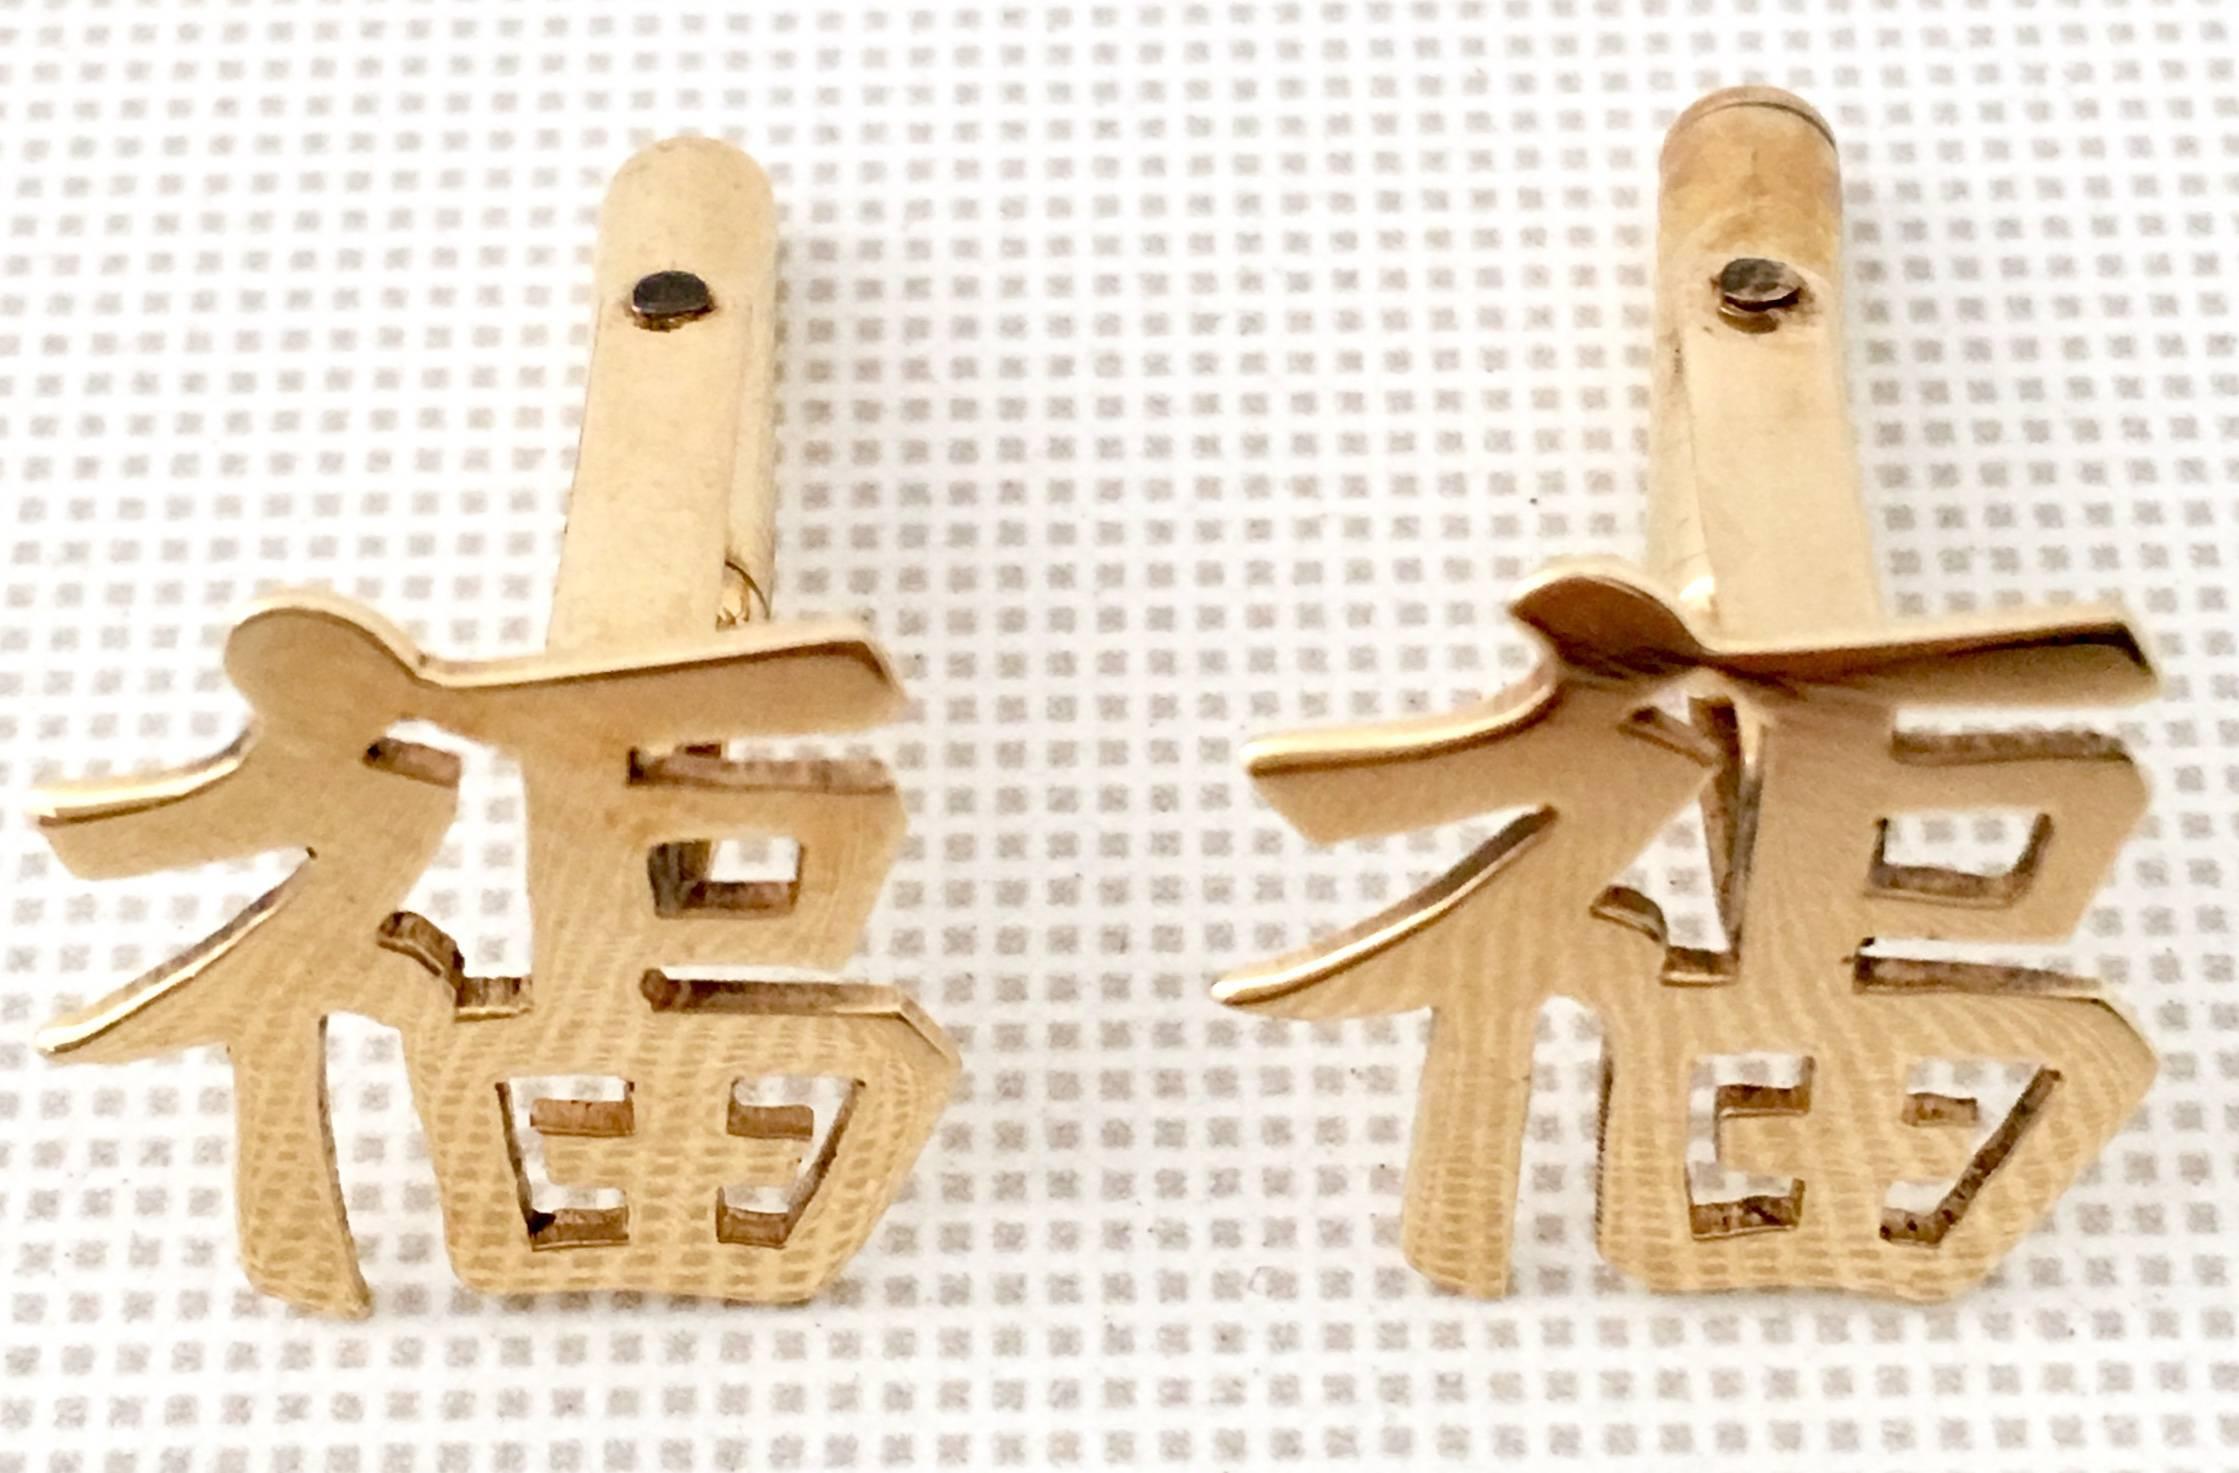 20th Century Pair Of Chinese Good Faith Symbol 14 K Gold Cufflink